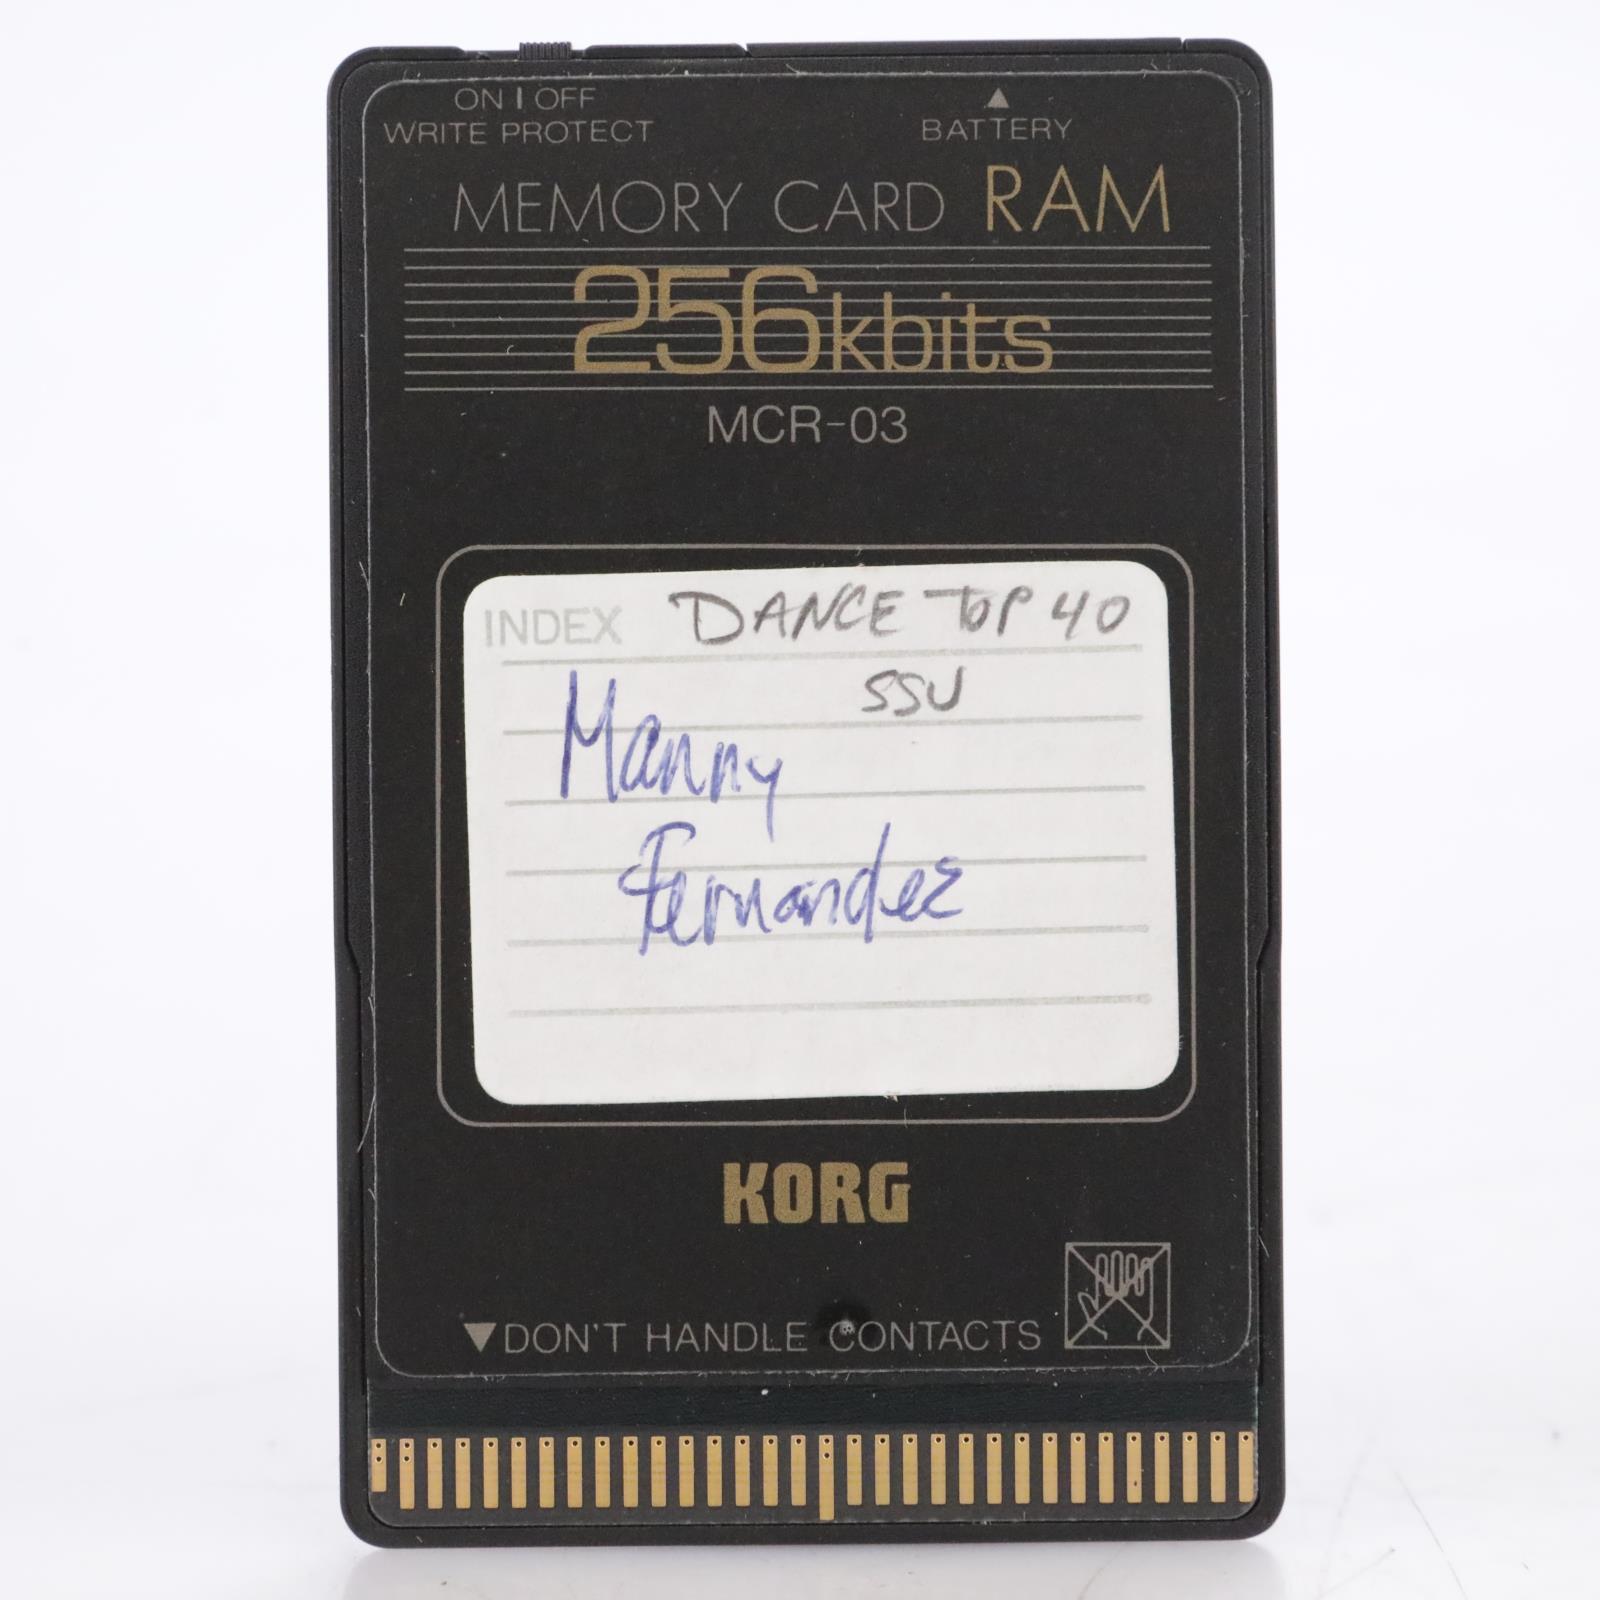 Korg MCR-03 256Kbits Dance Top 40 SSU RAM Memory Card #44189